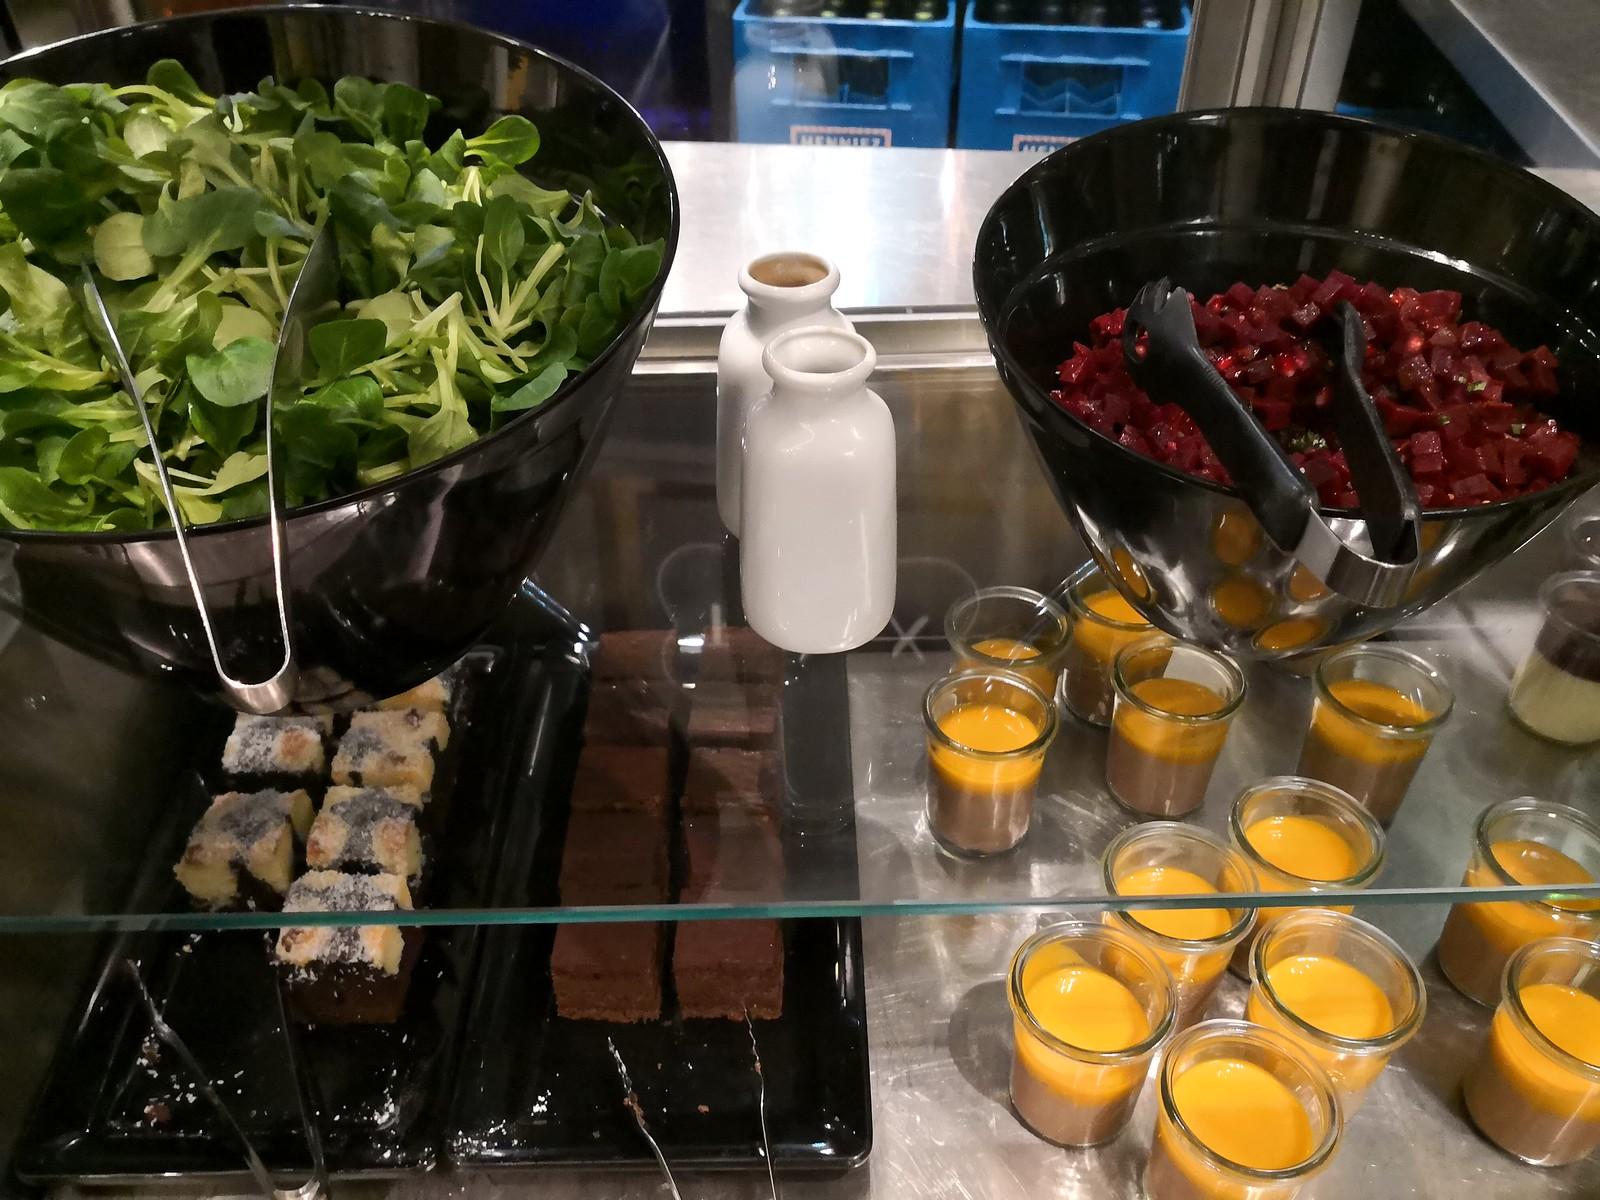 Salad and desserts